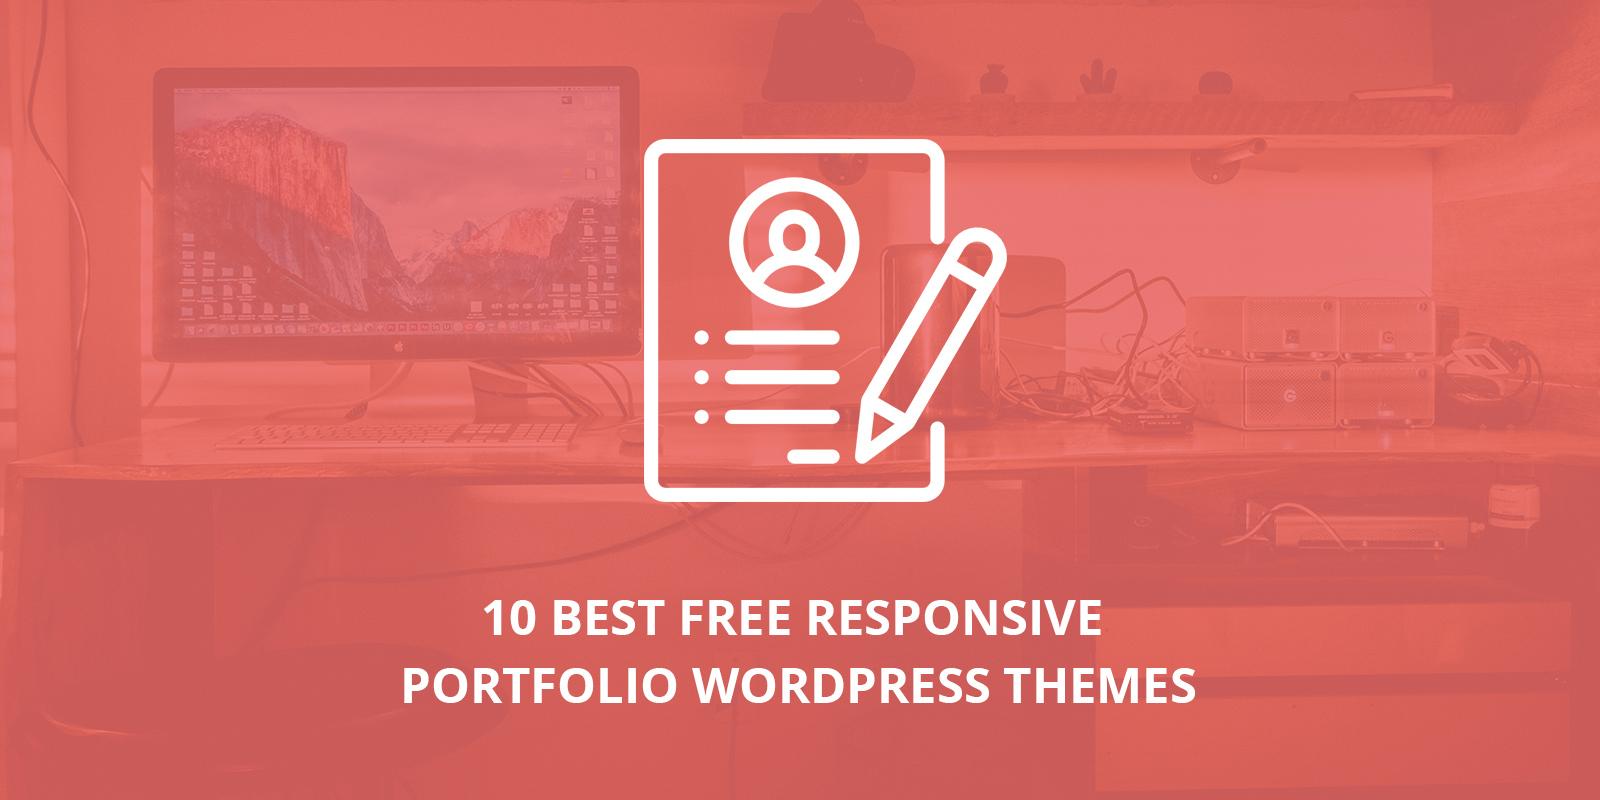 10 Best Free Responsive Portfolio WordPress Themes [sigma_current_year]